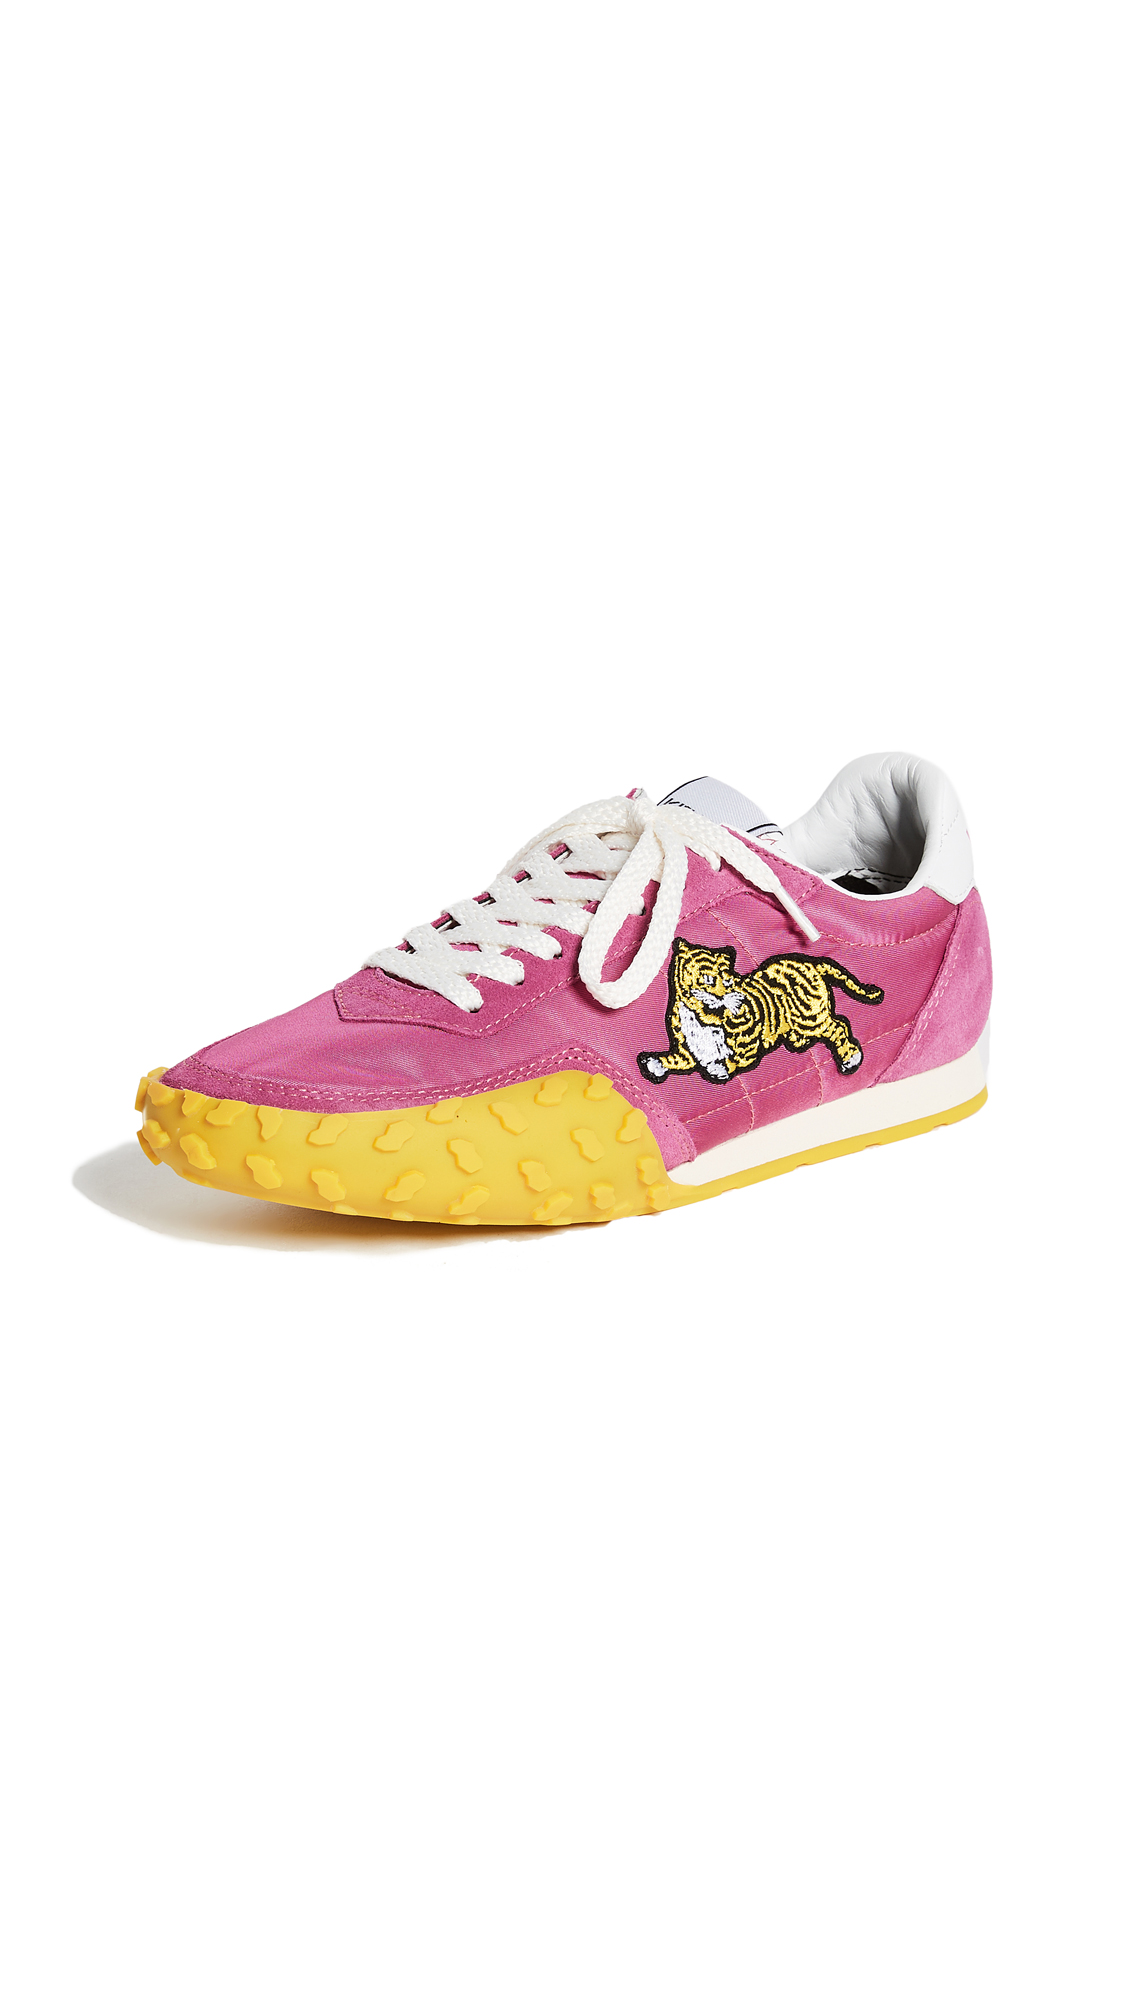 KENZO K-Run Memento Sneakers - Fuchsia